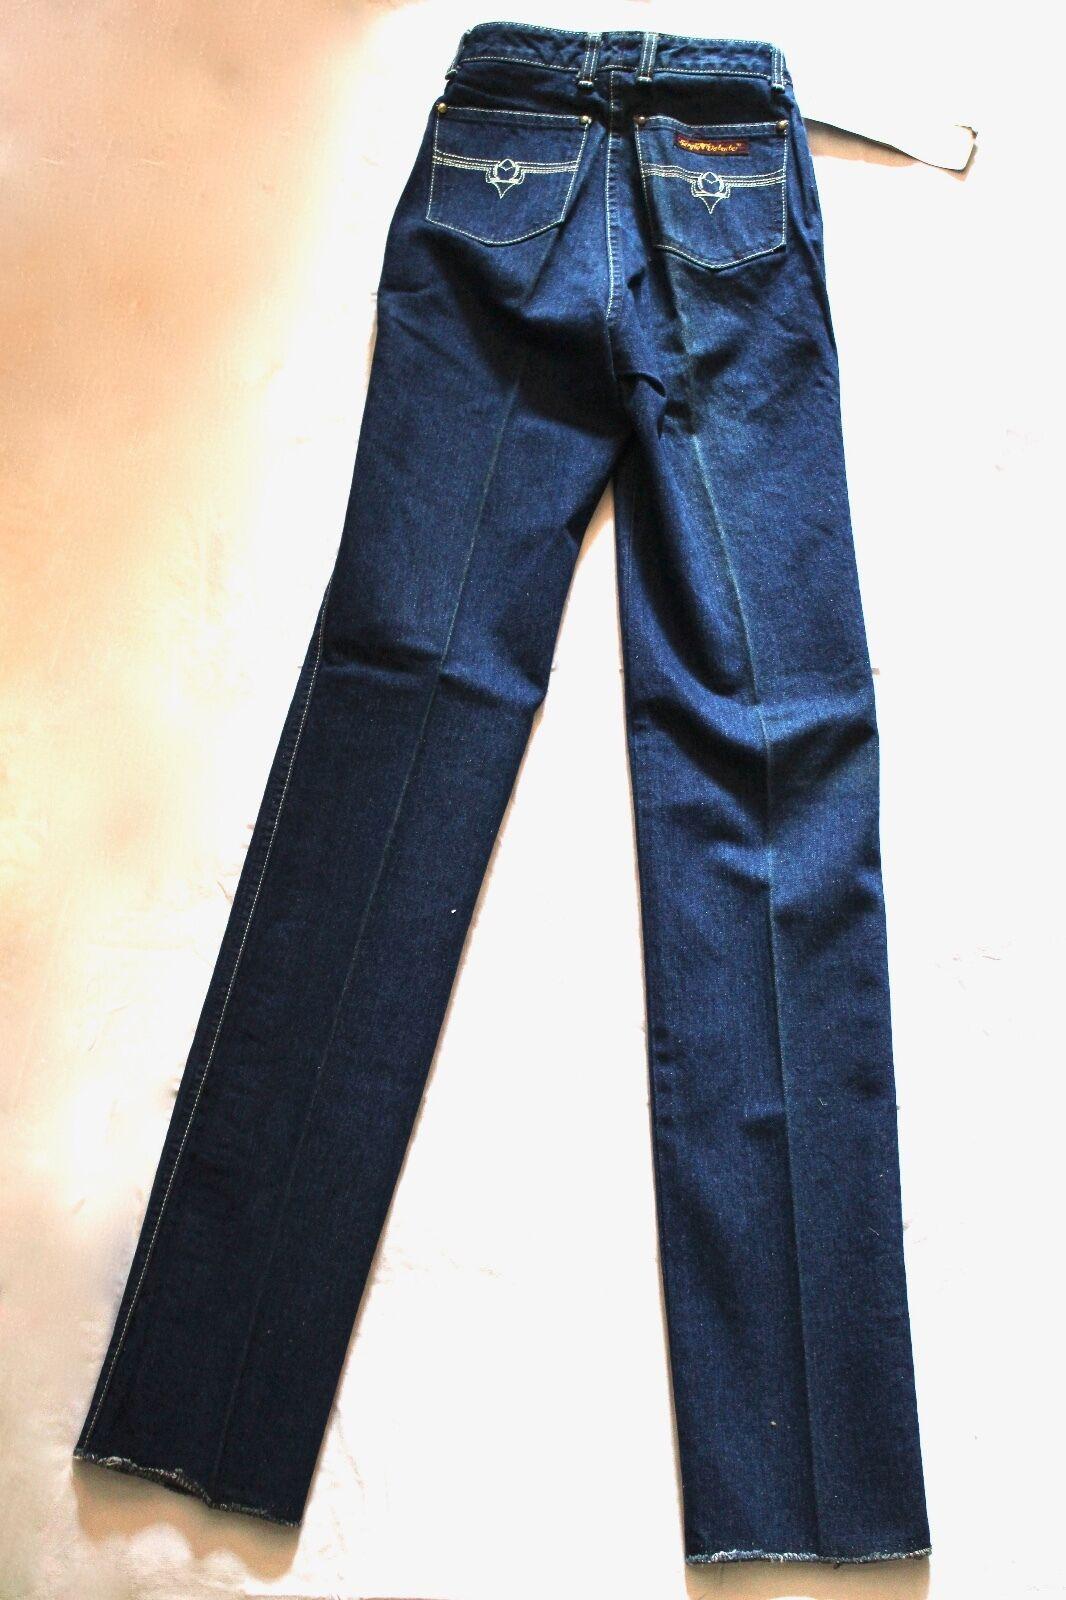 متهور سعيد أبقه مرتفعا Pantalones Sergio Valente Para Hombre Amitie Franco Malgache Org